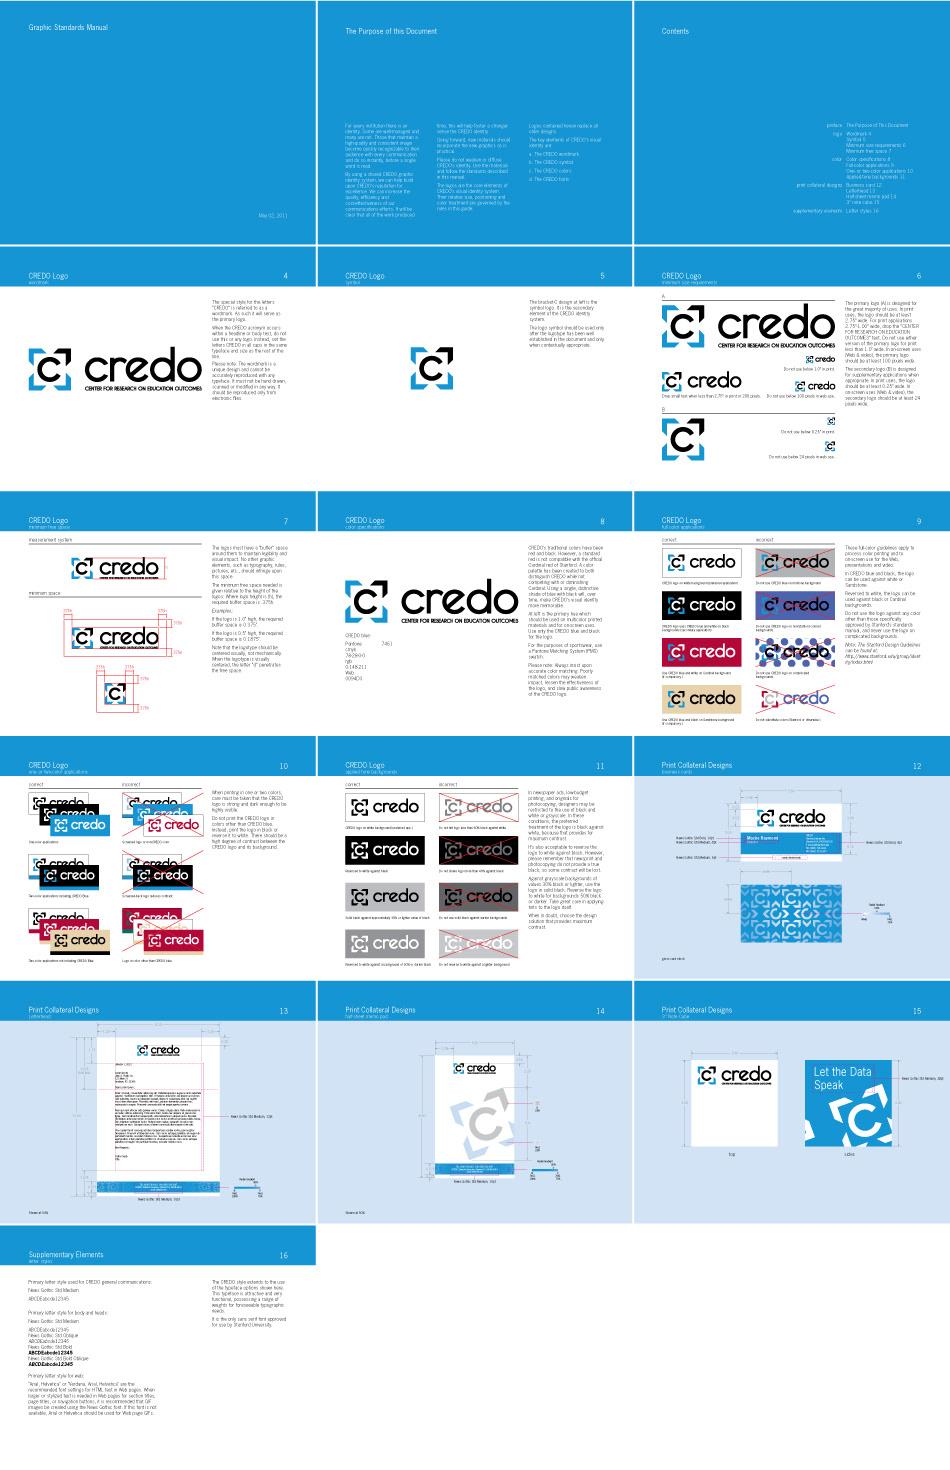 C Davis Designs - CREDO at Stanford University